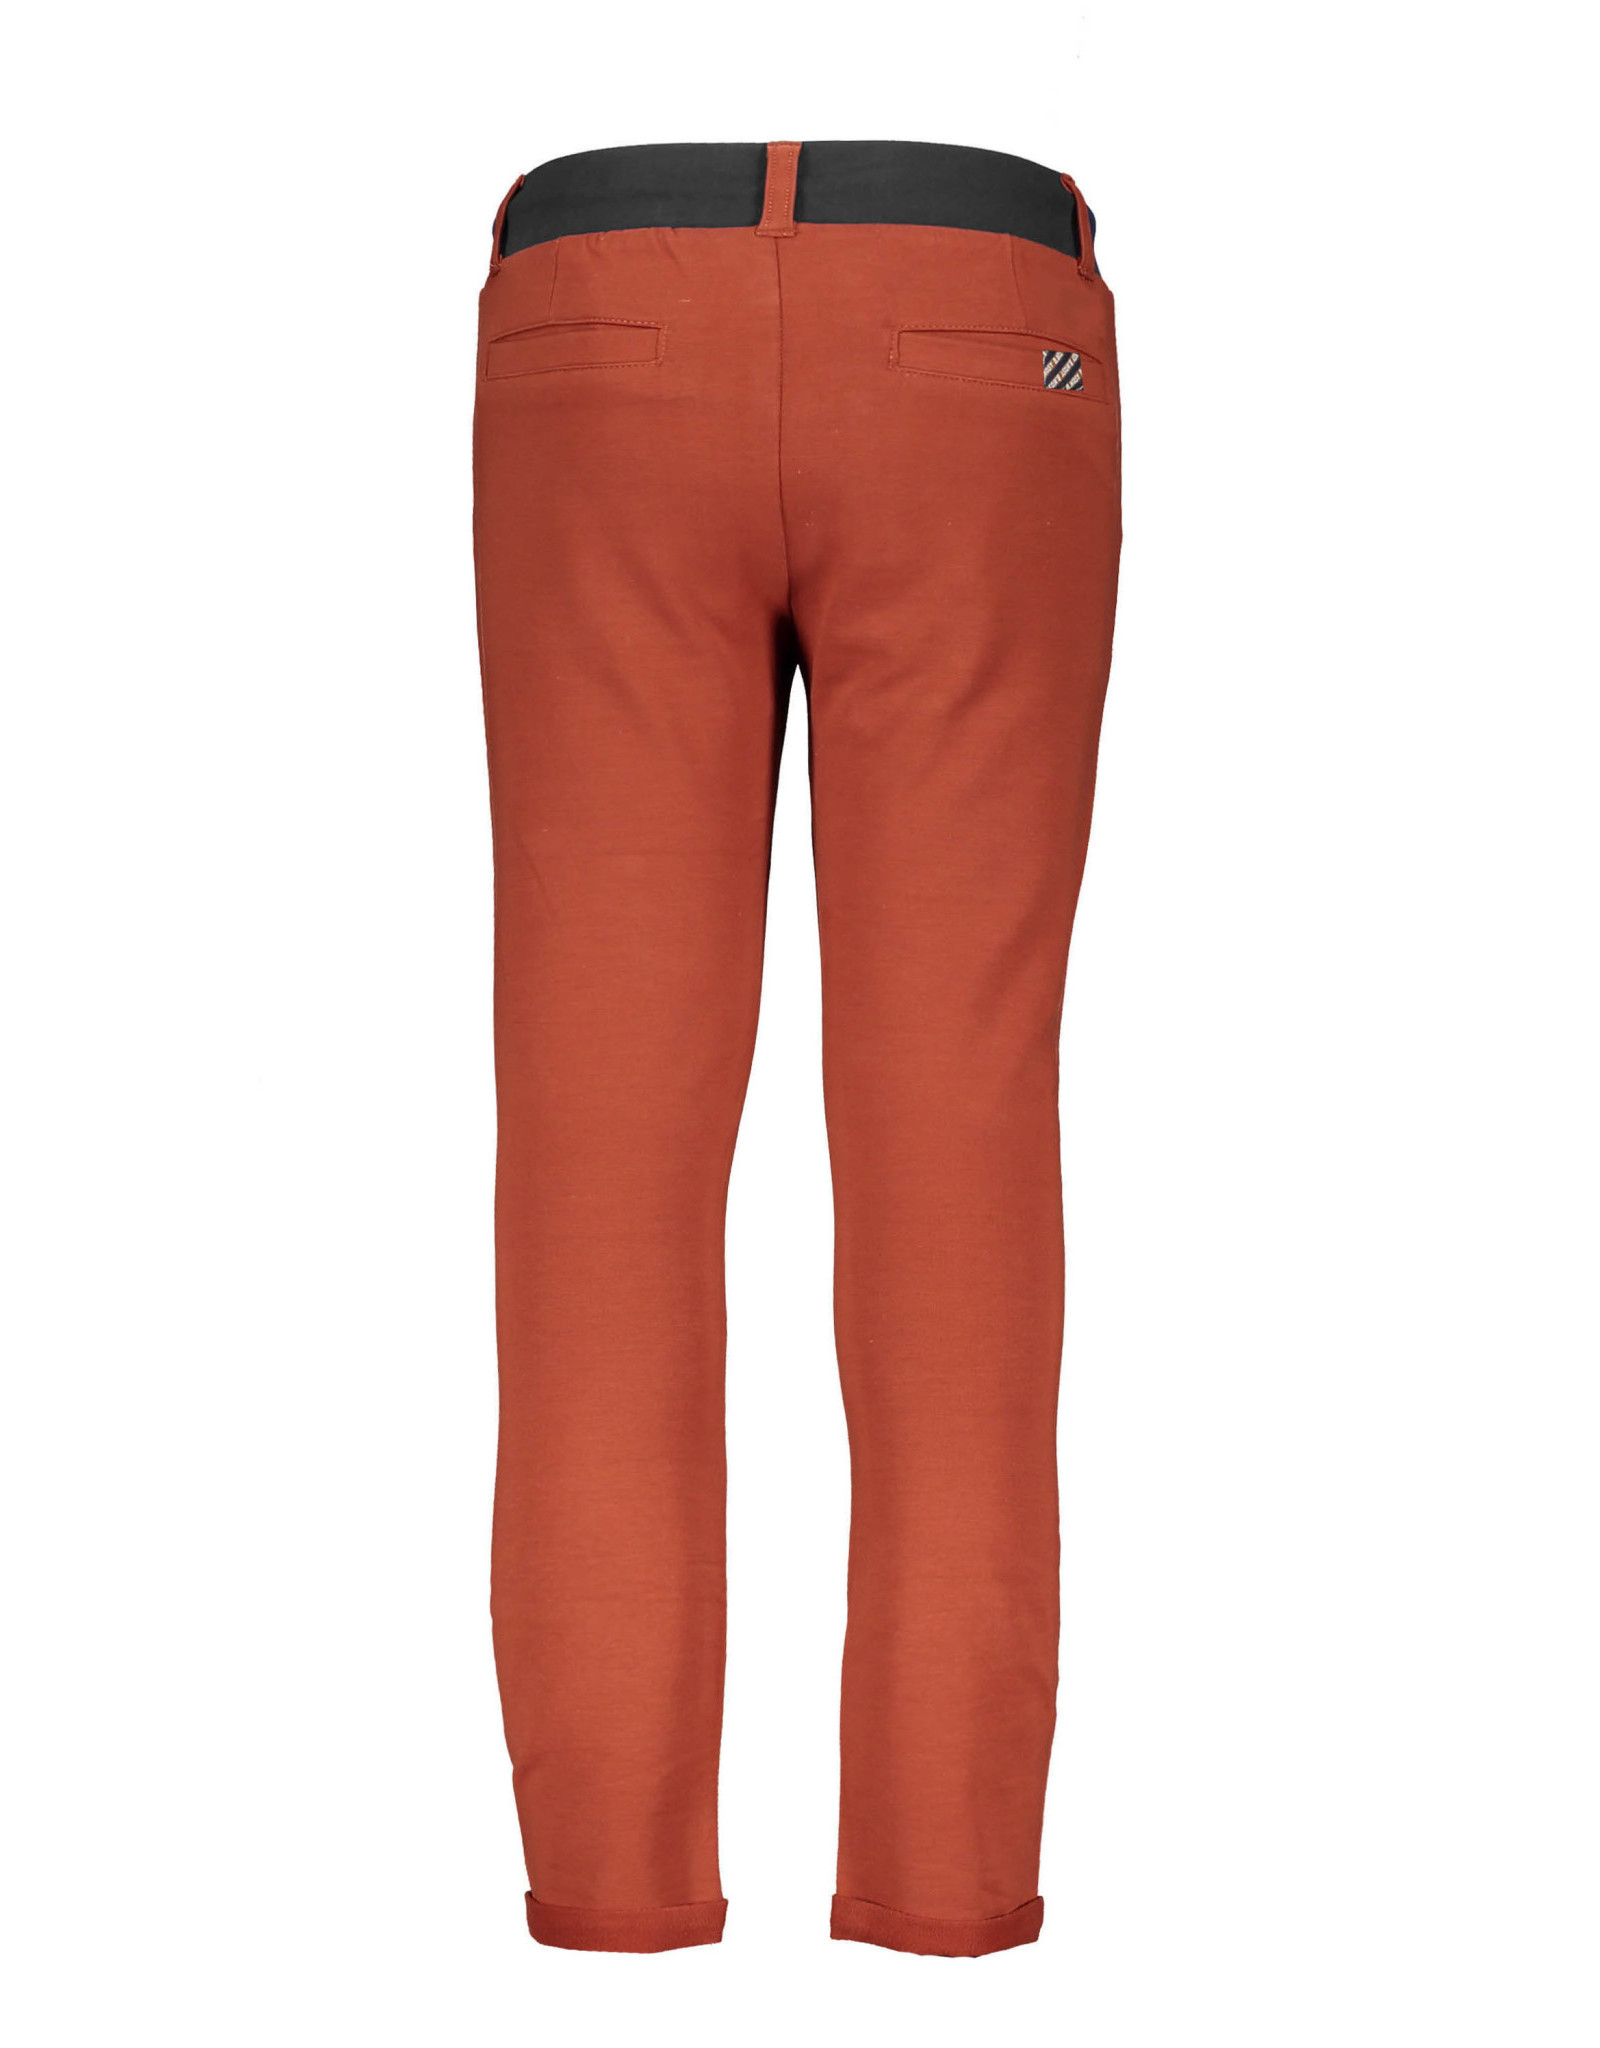 B-nosy Boys sweat pants with folded hem 223 brique